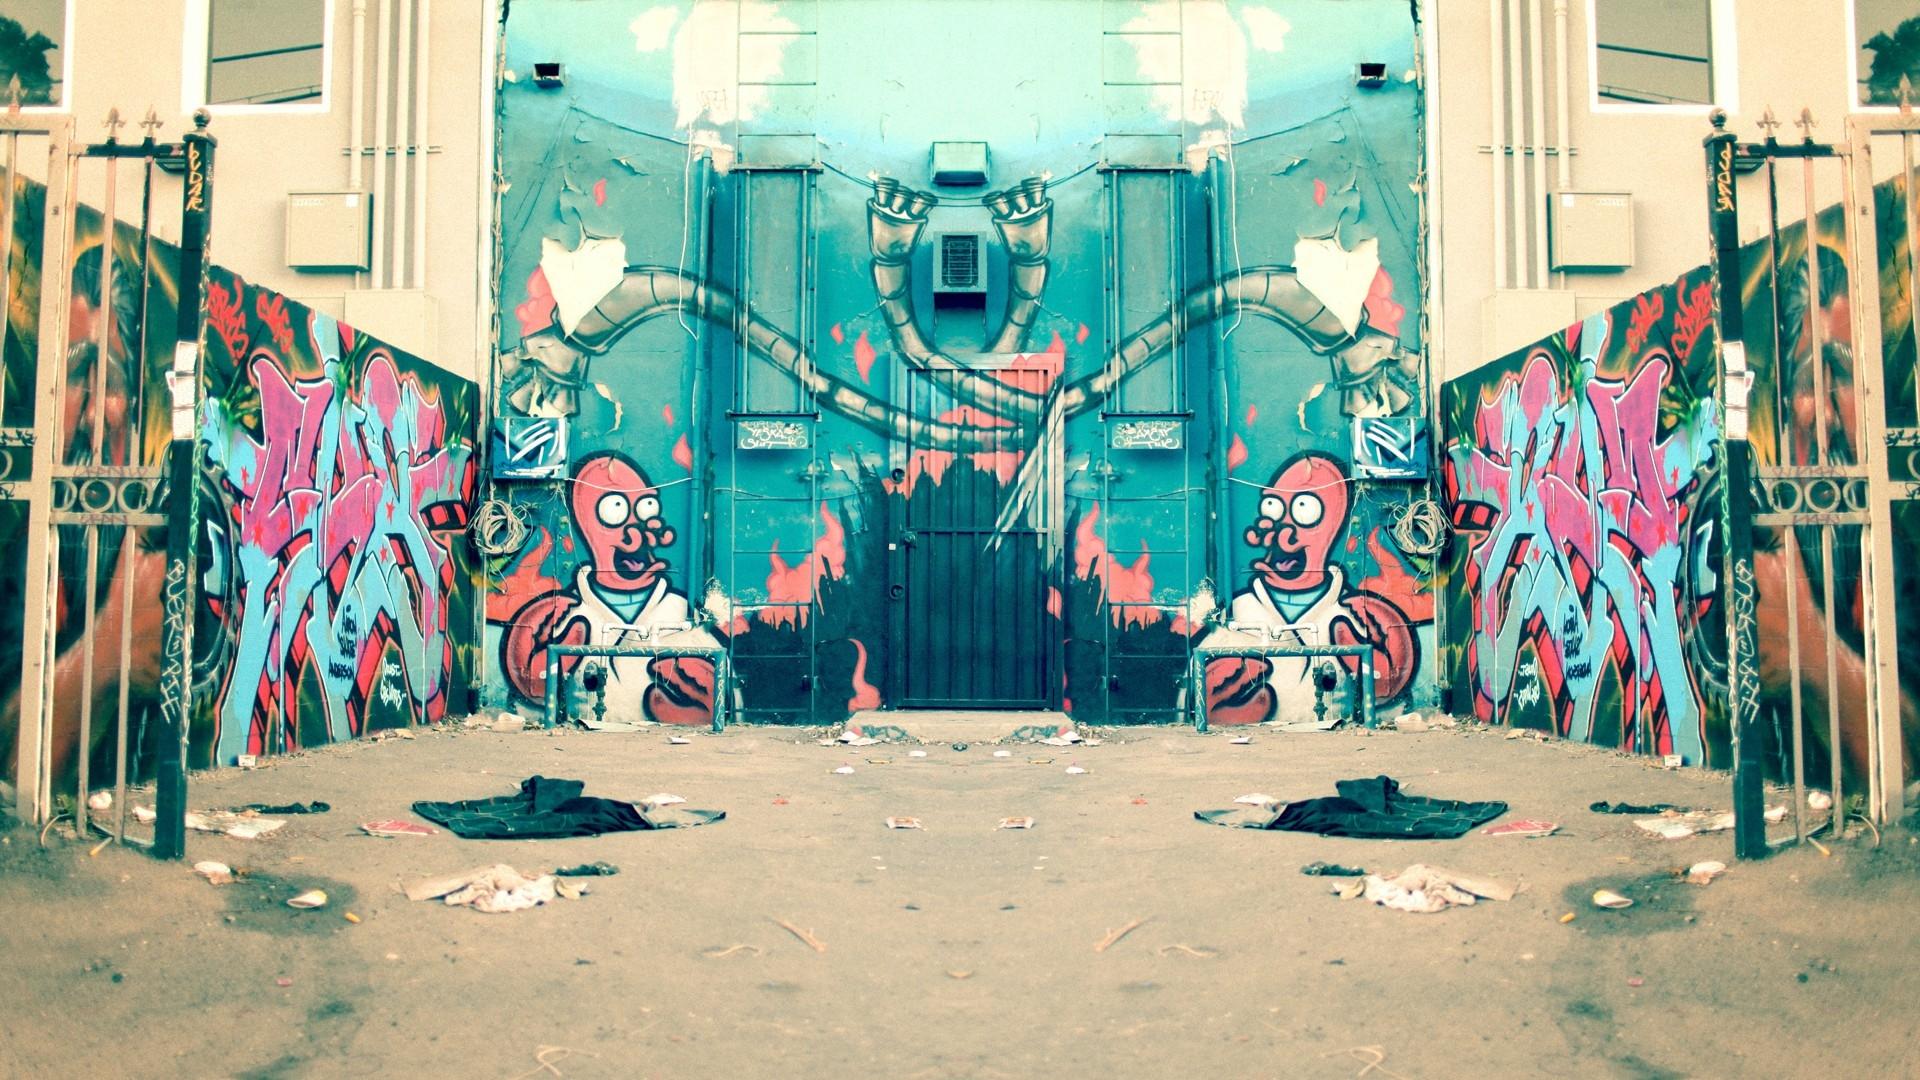 граффити смешные обои фото присяга существует